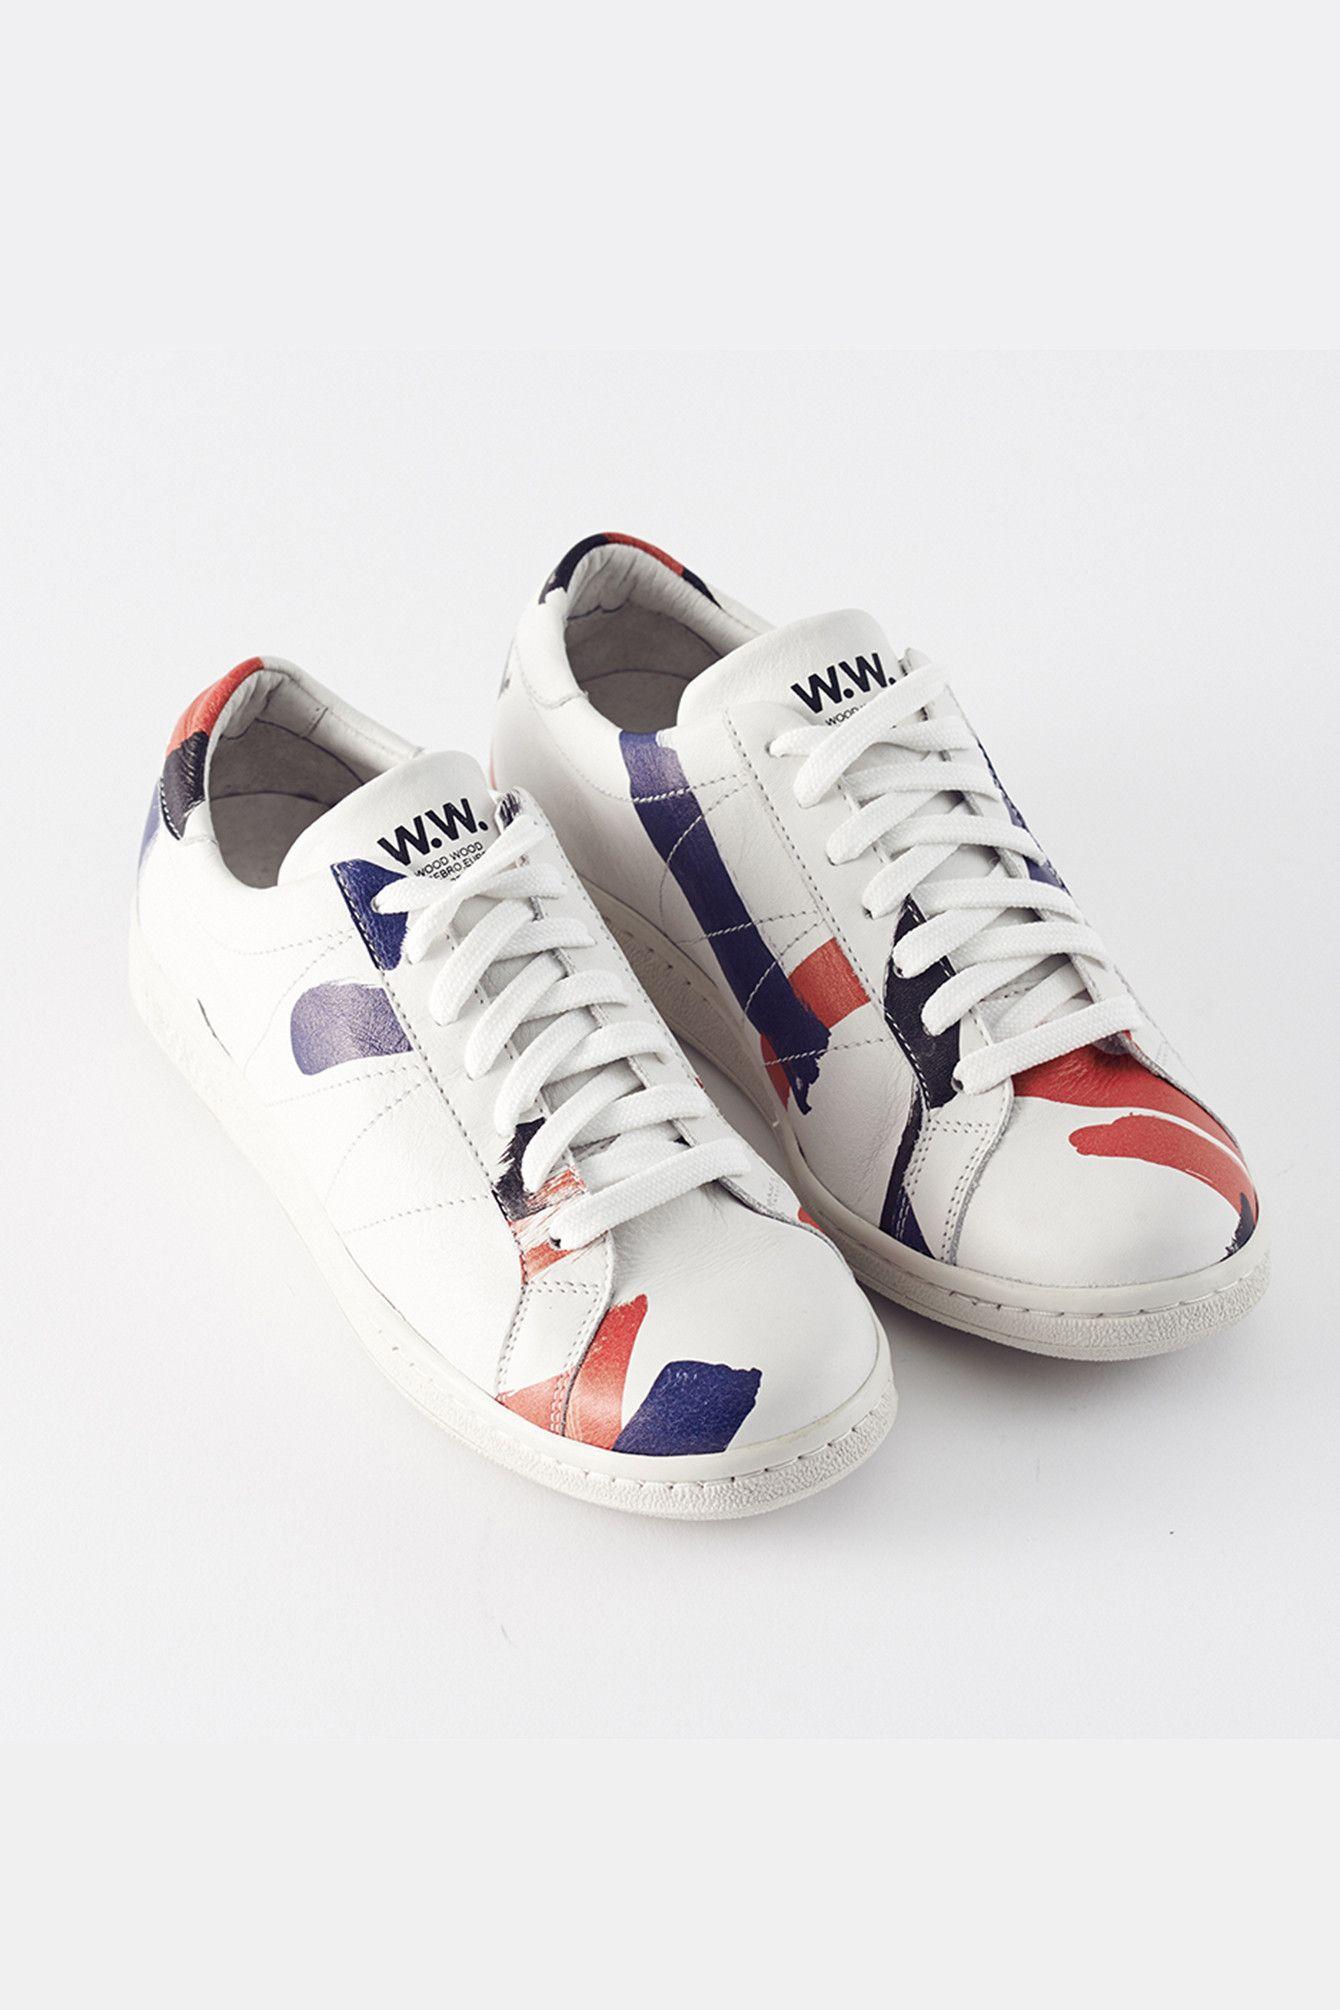 Wood Wood Bo Shoe Sneakers White Paint